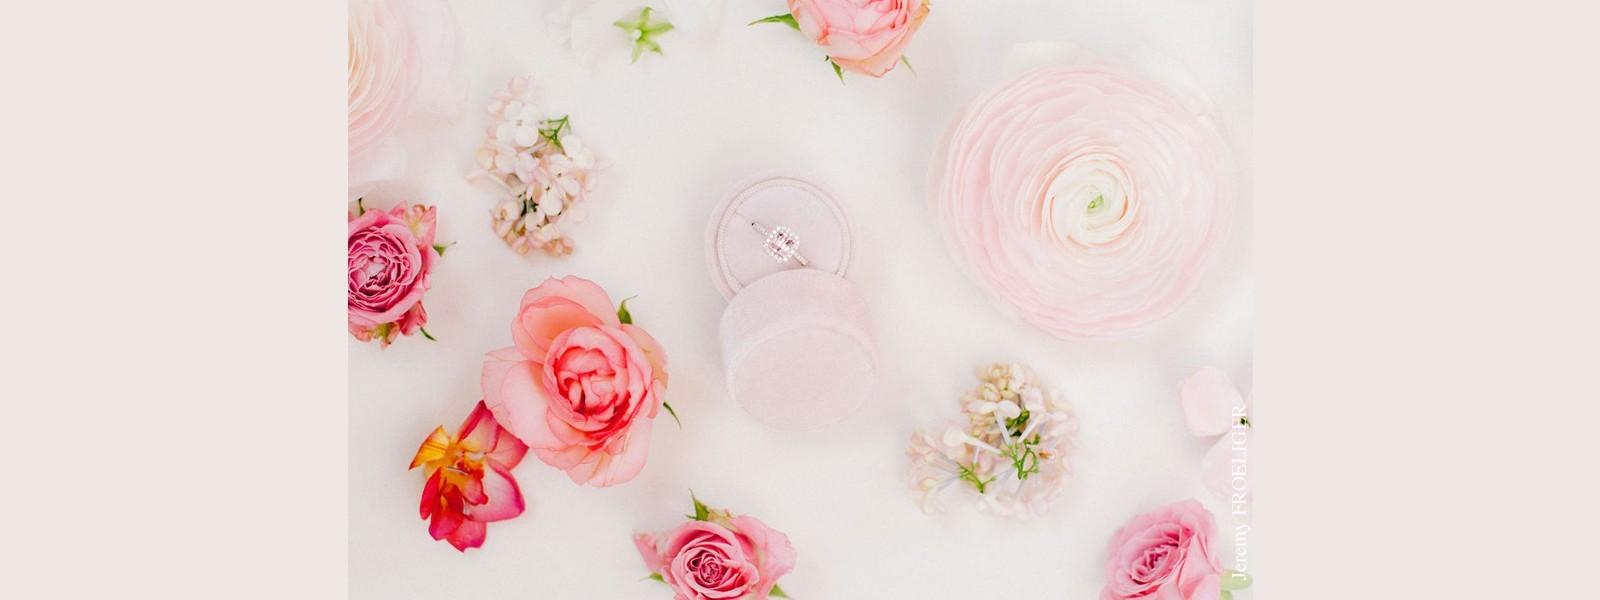 Solitaire saphir rose